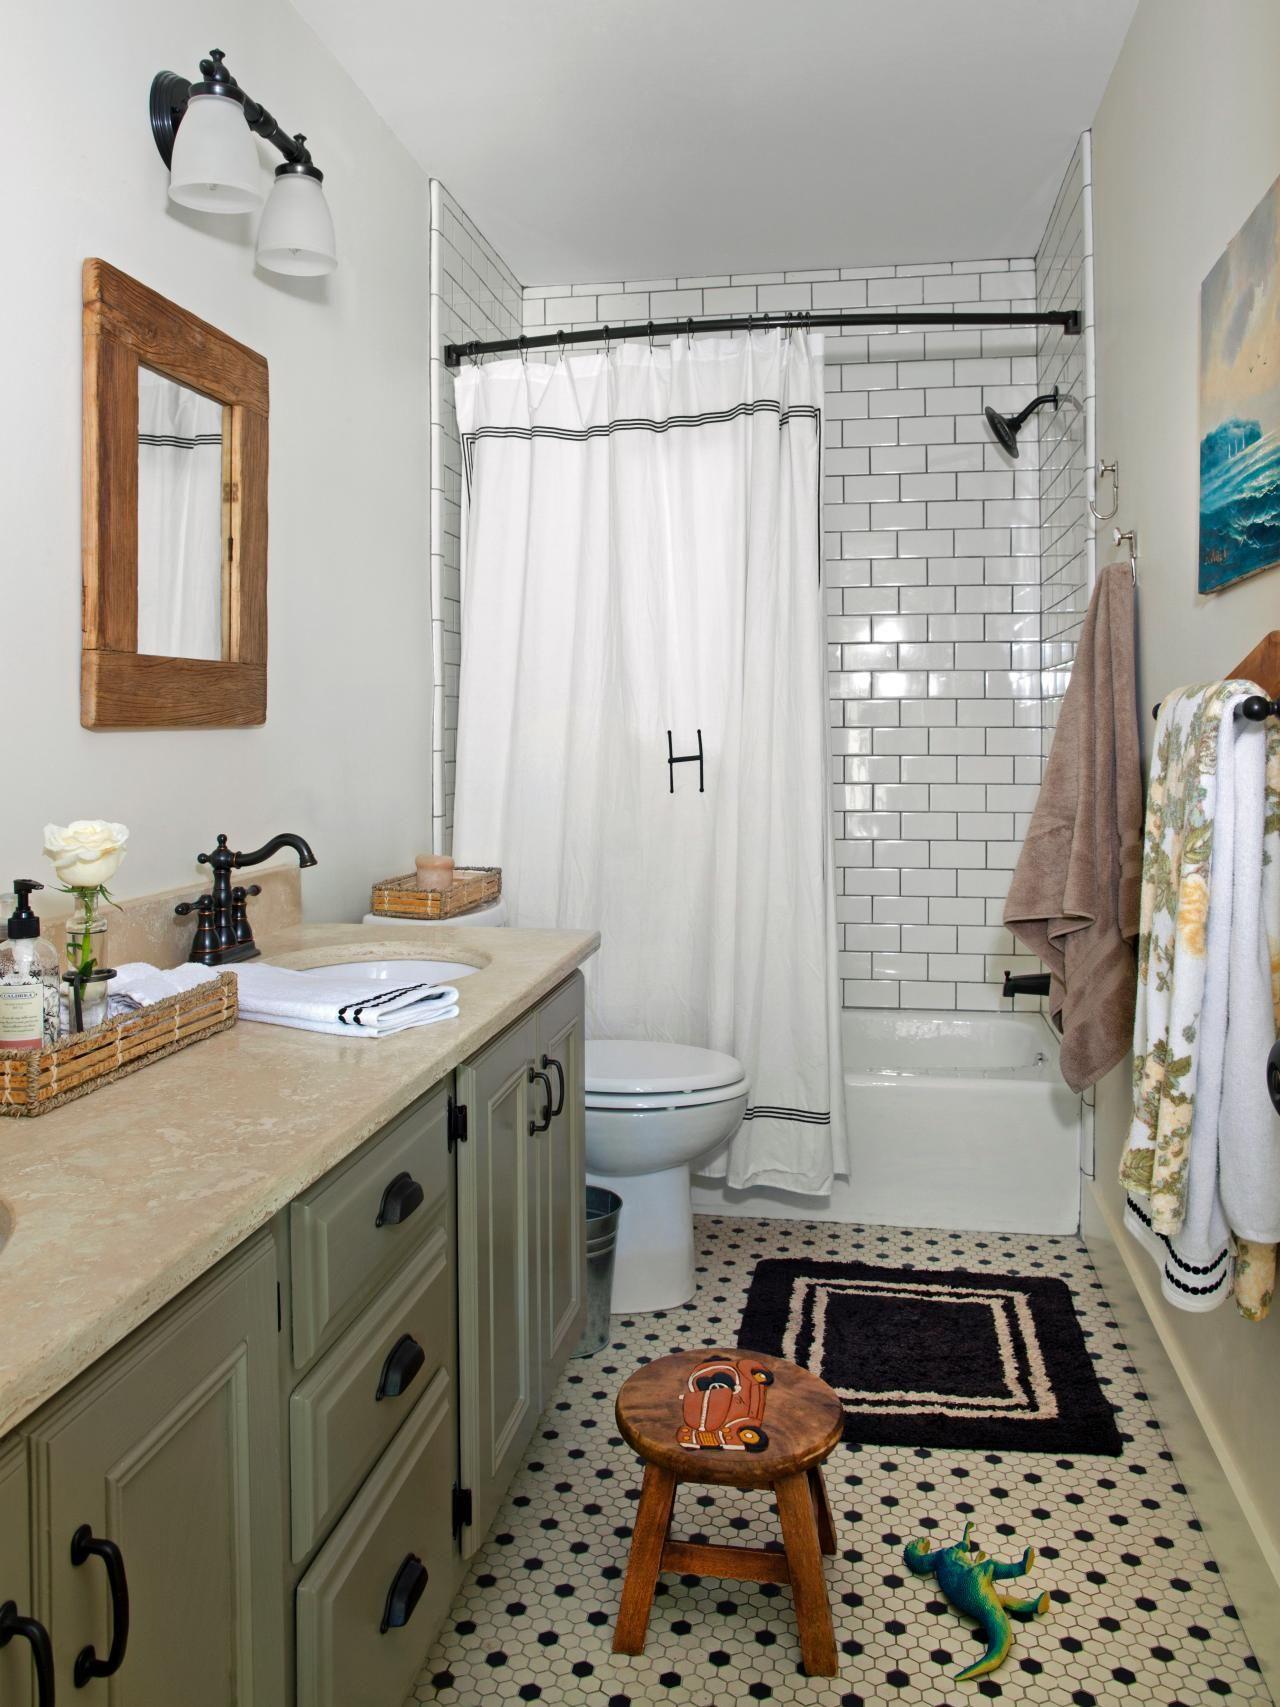 DP_Darnell-Cottage-Boys-Bathroom_s3x4.jpg.rend.hgtvcom.1280.1707 ...